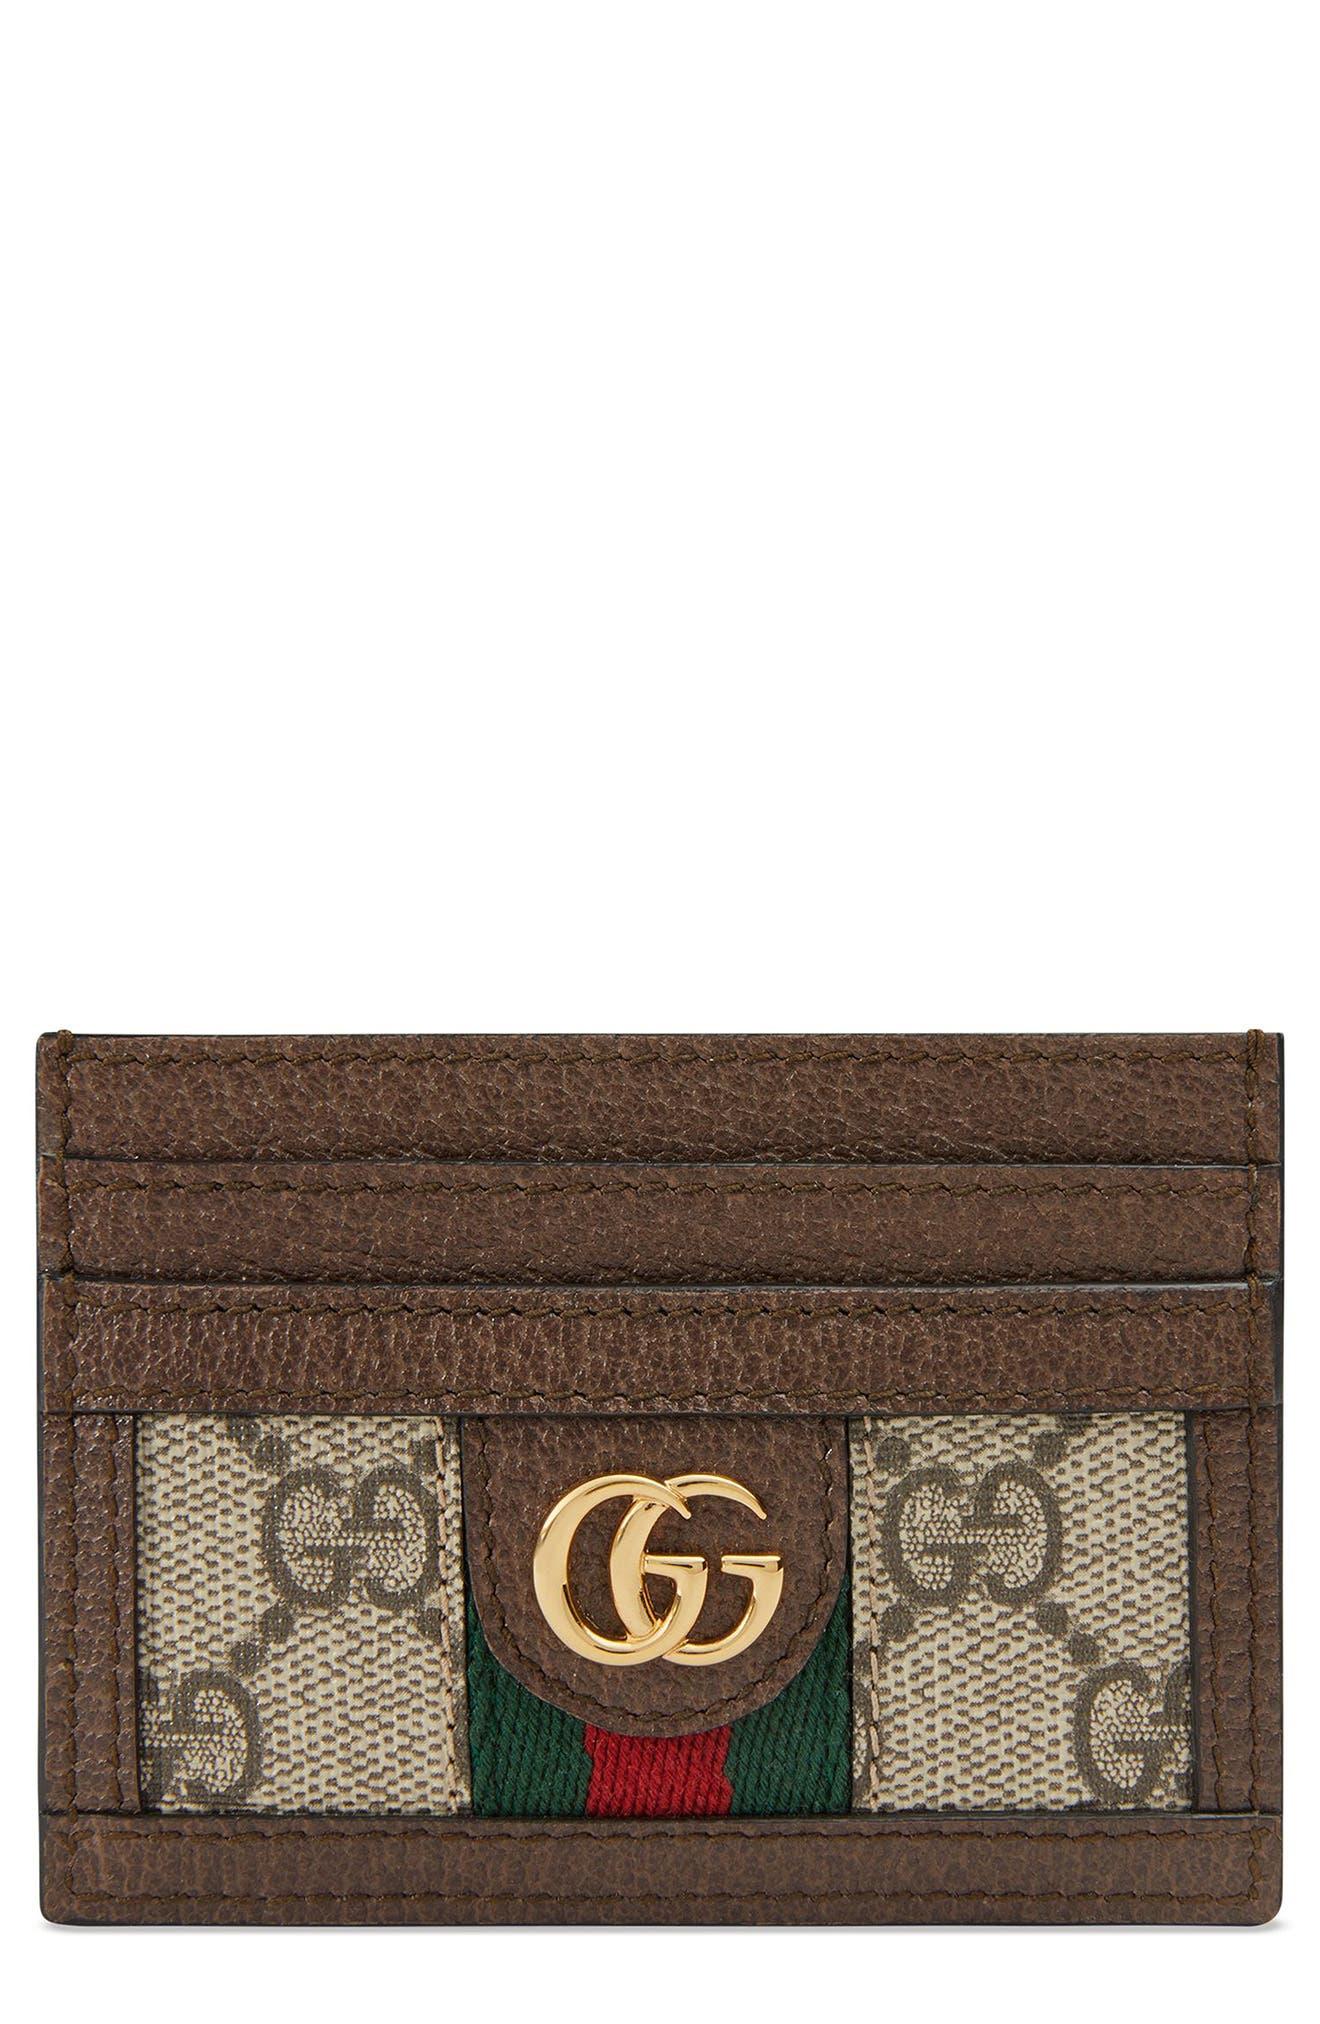 GUCCI Ophidia GG Supreme Card Case, Main, color, BEIGE EBONY/ ACERO/ VERT RED